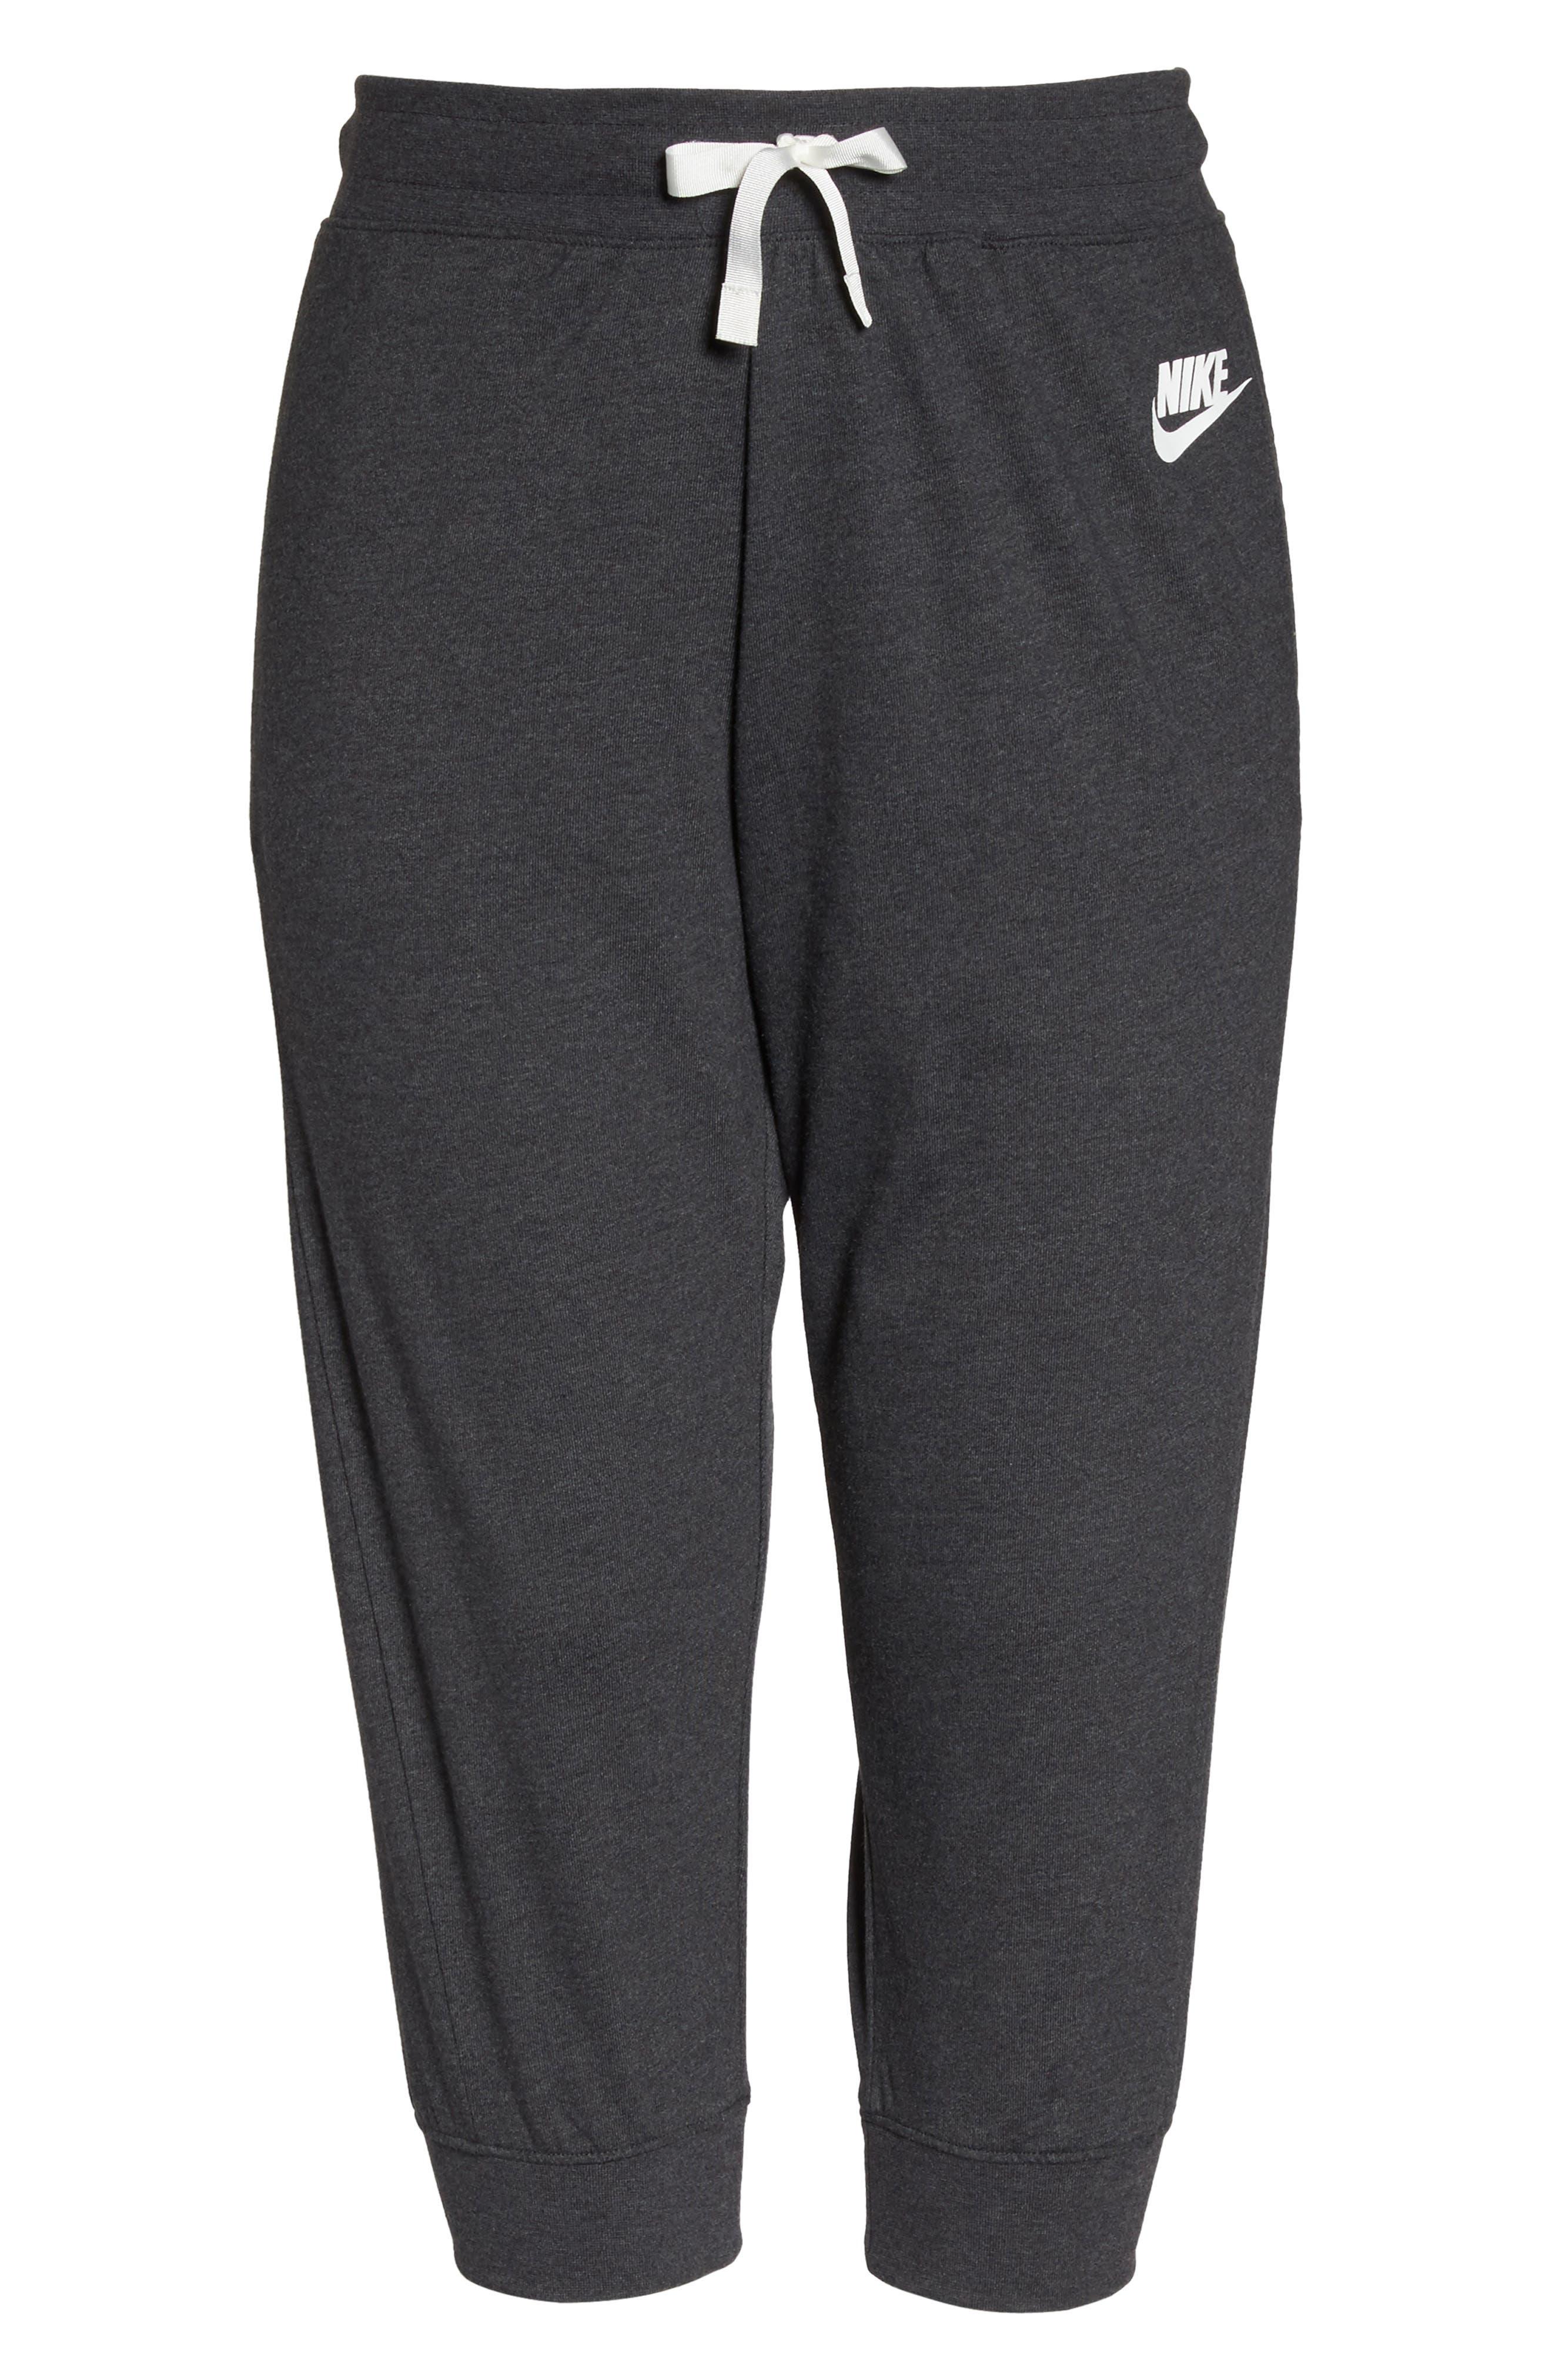 Sportswear Gym Capris,                             Alternate thumbnail 6, color,                             Black Heather/ Sail